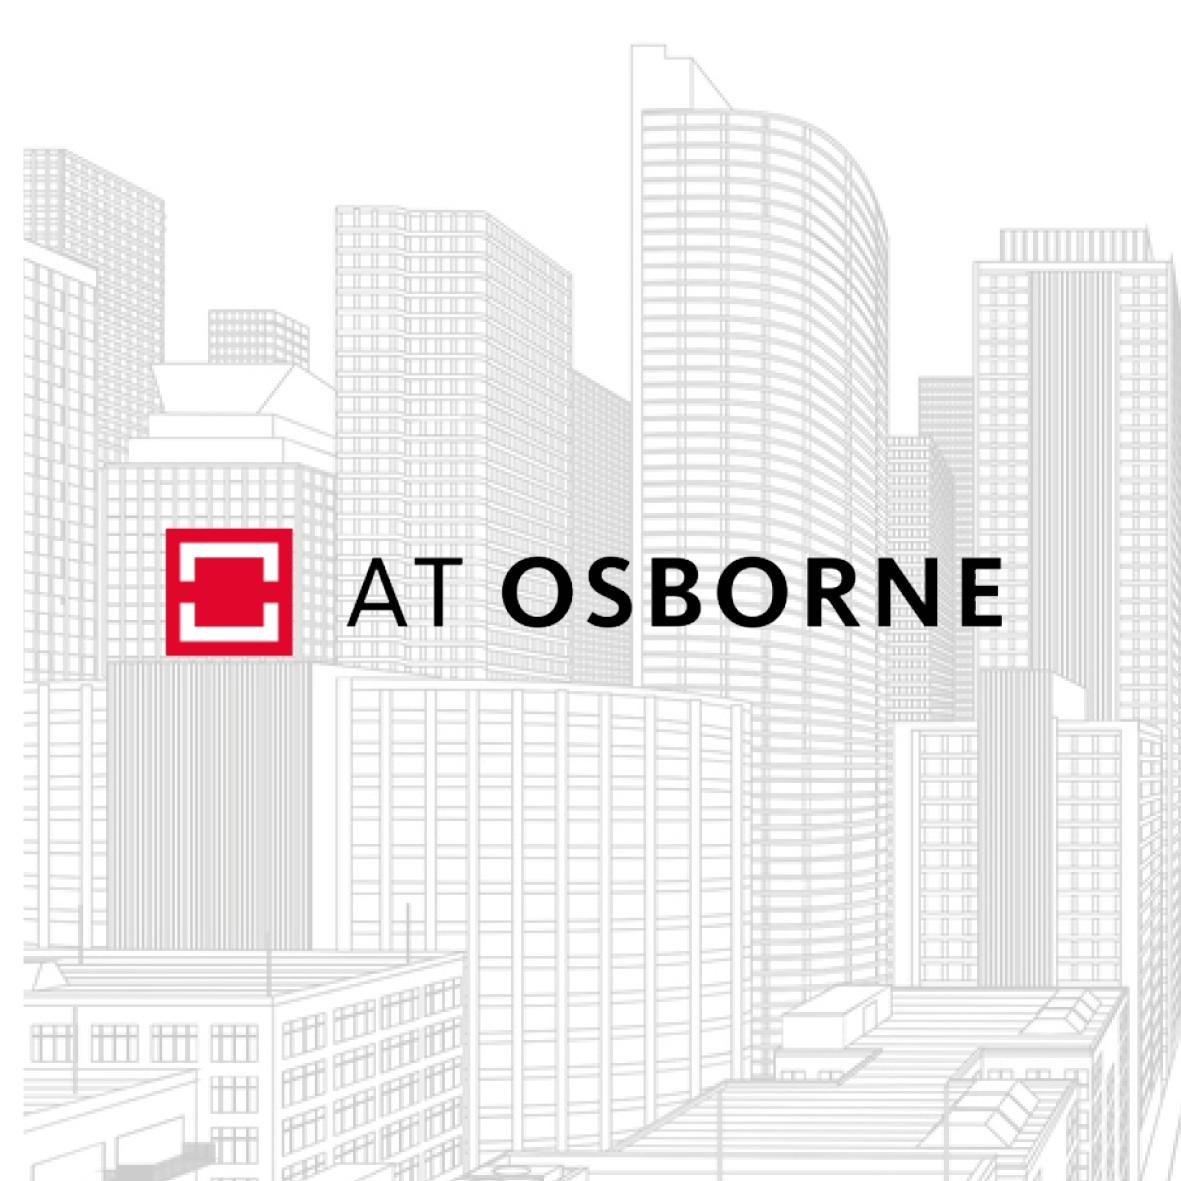 At Osborne Newsarticle